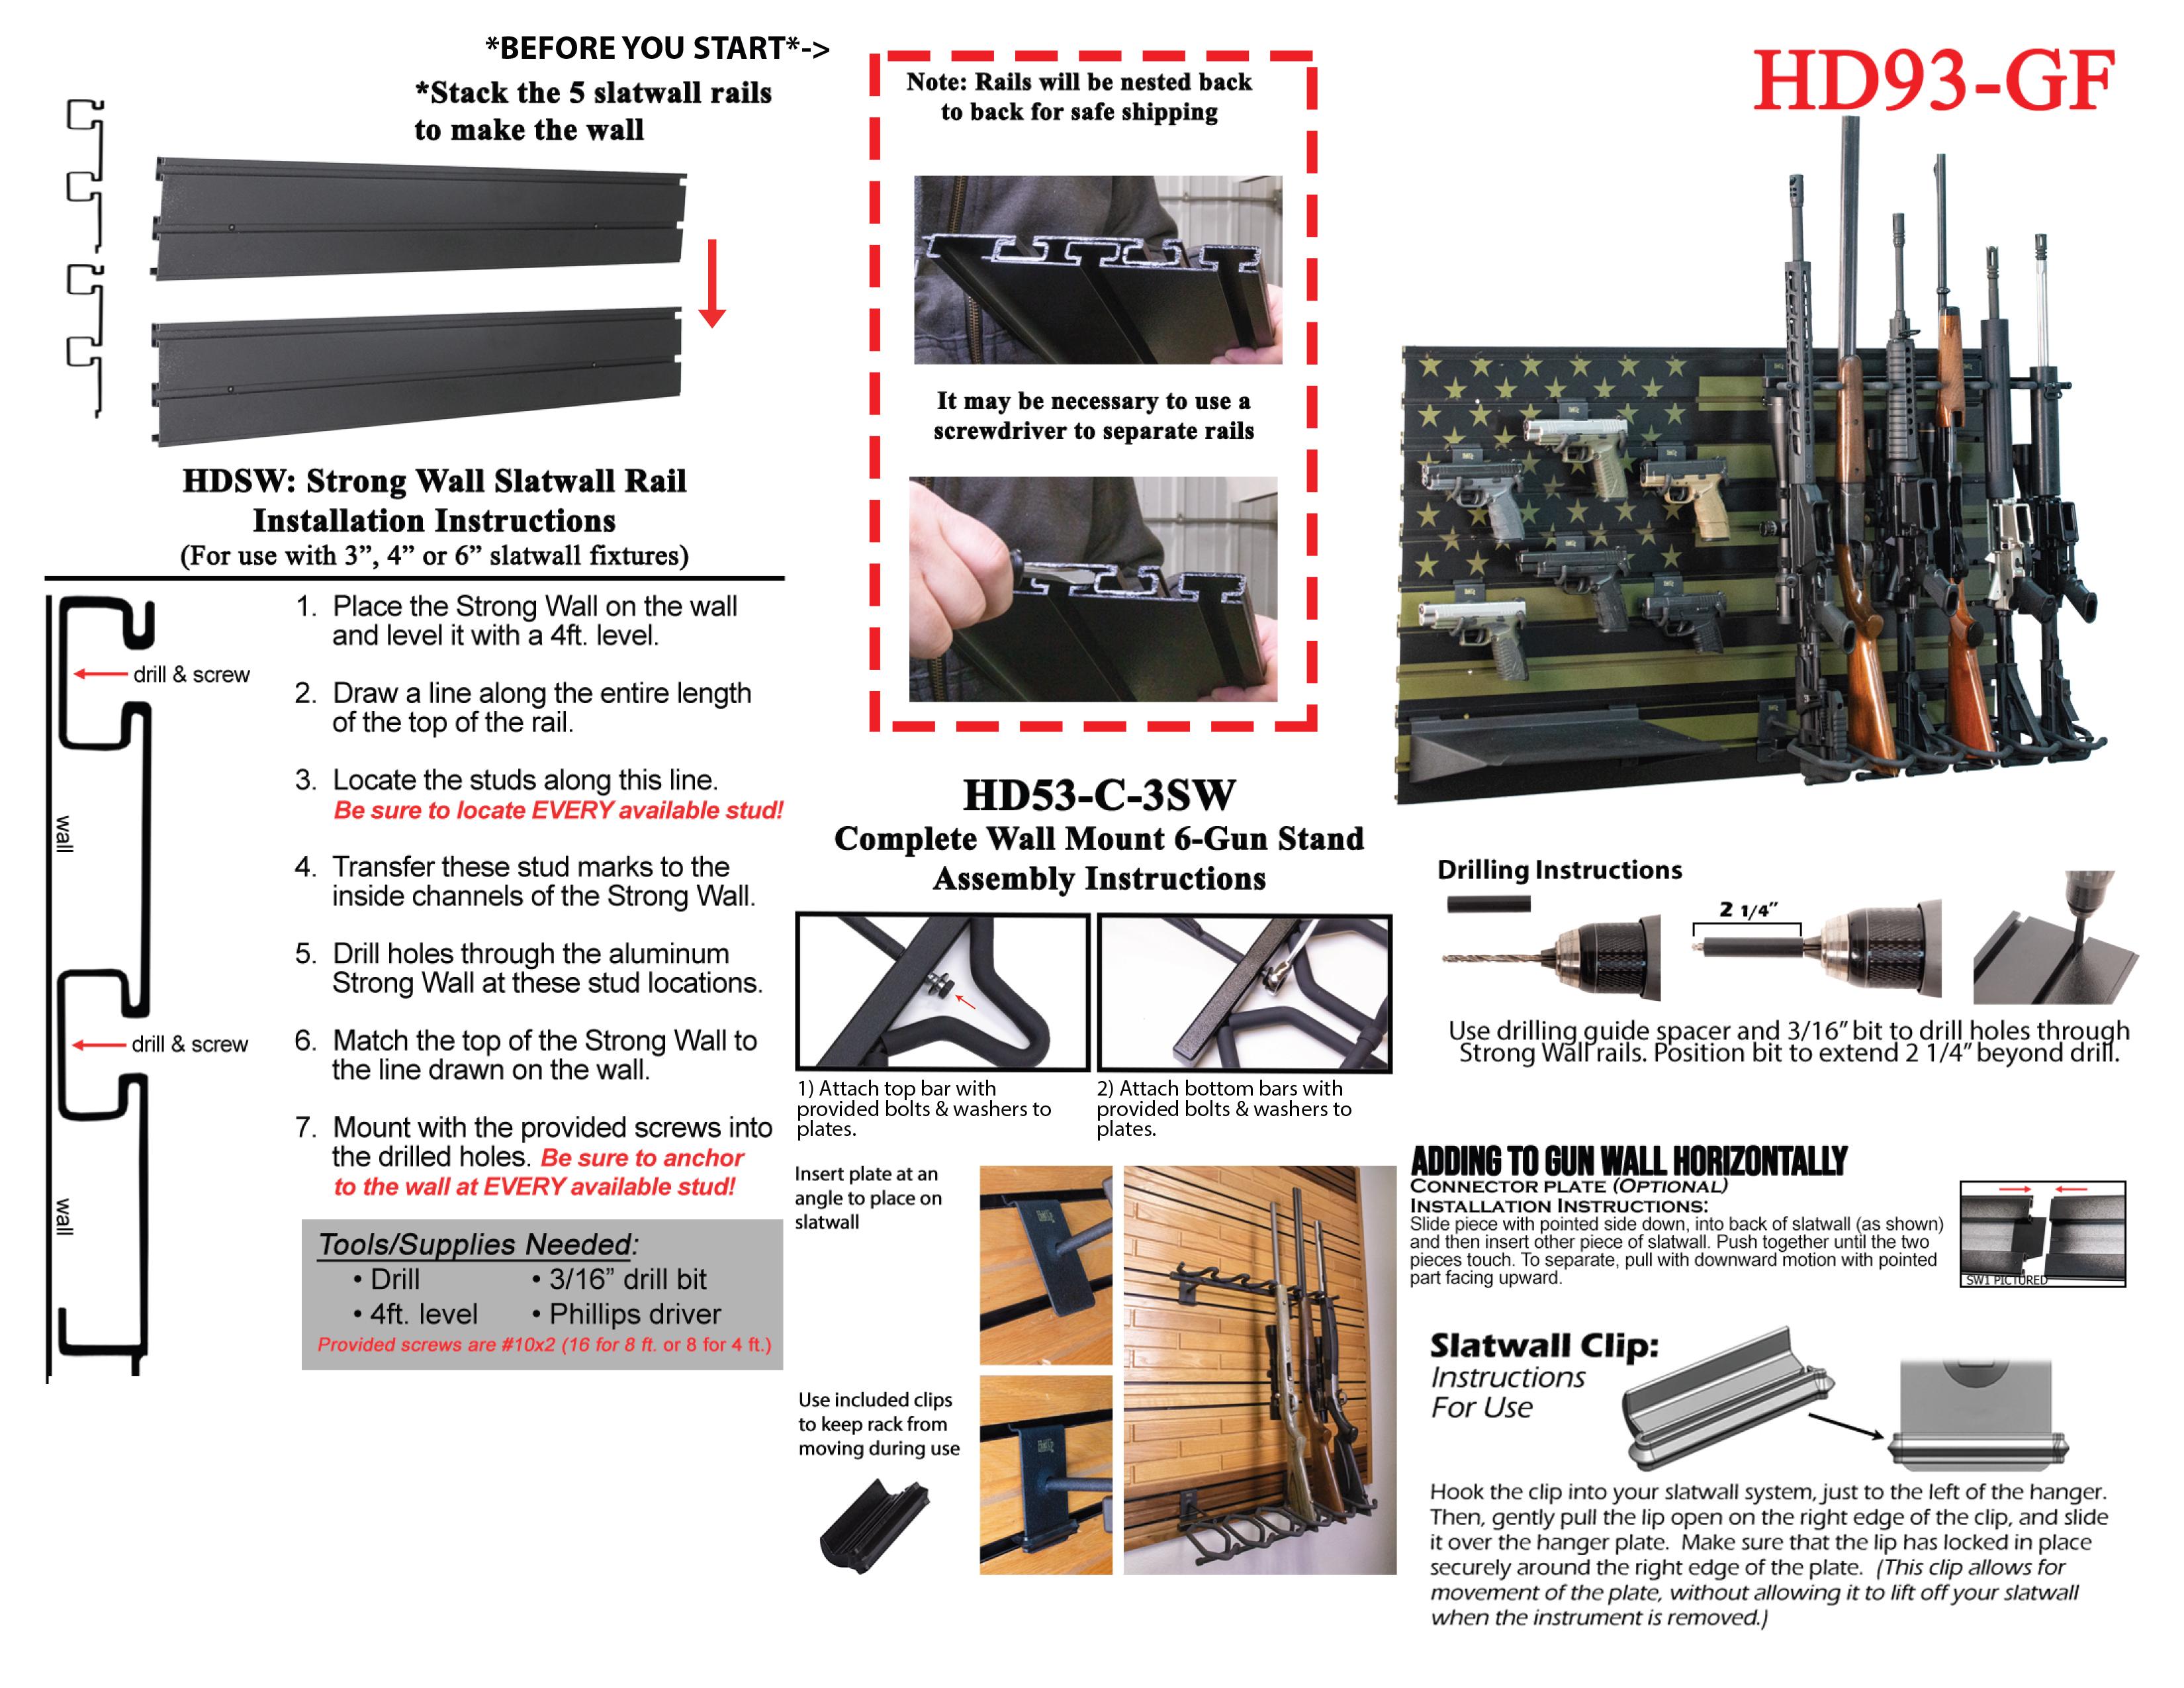 hd93-gf-update.jpg